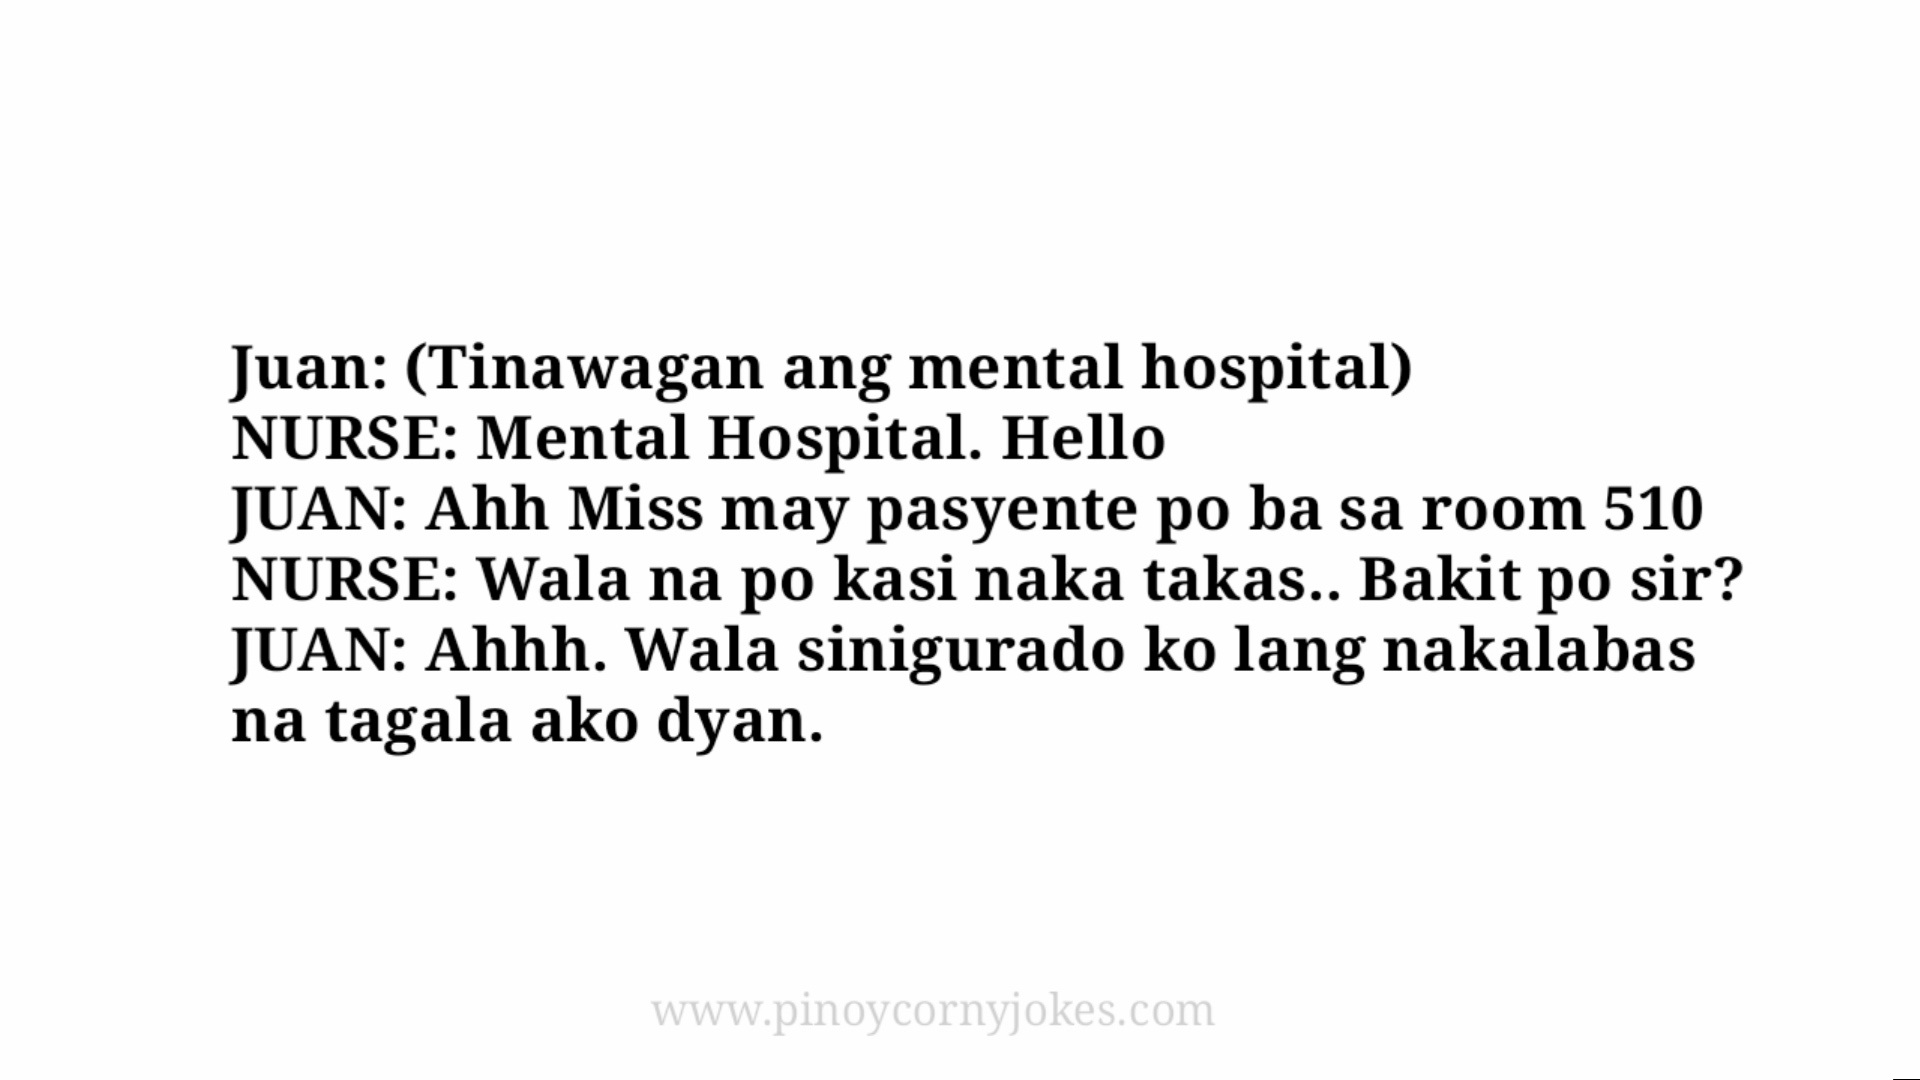 juan mental hospital joke time nars